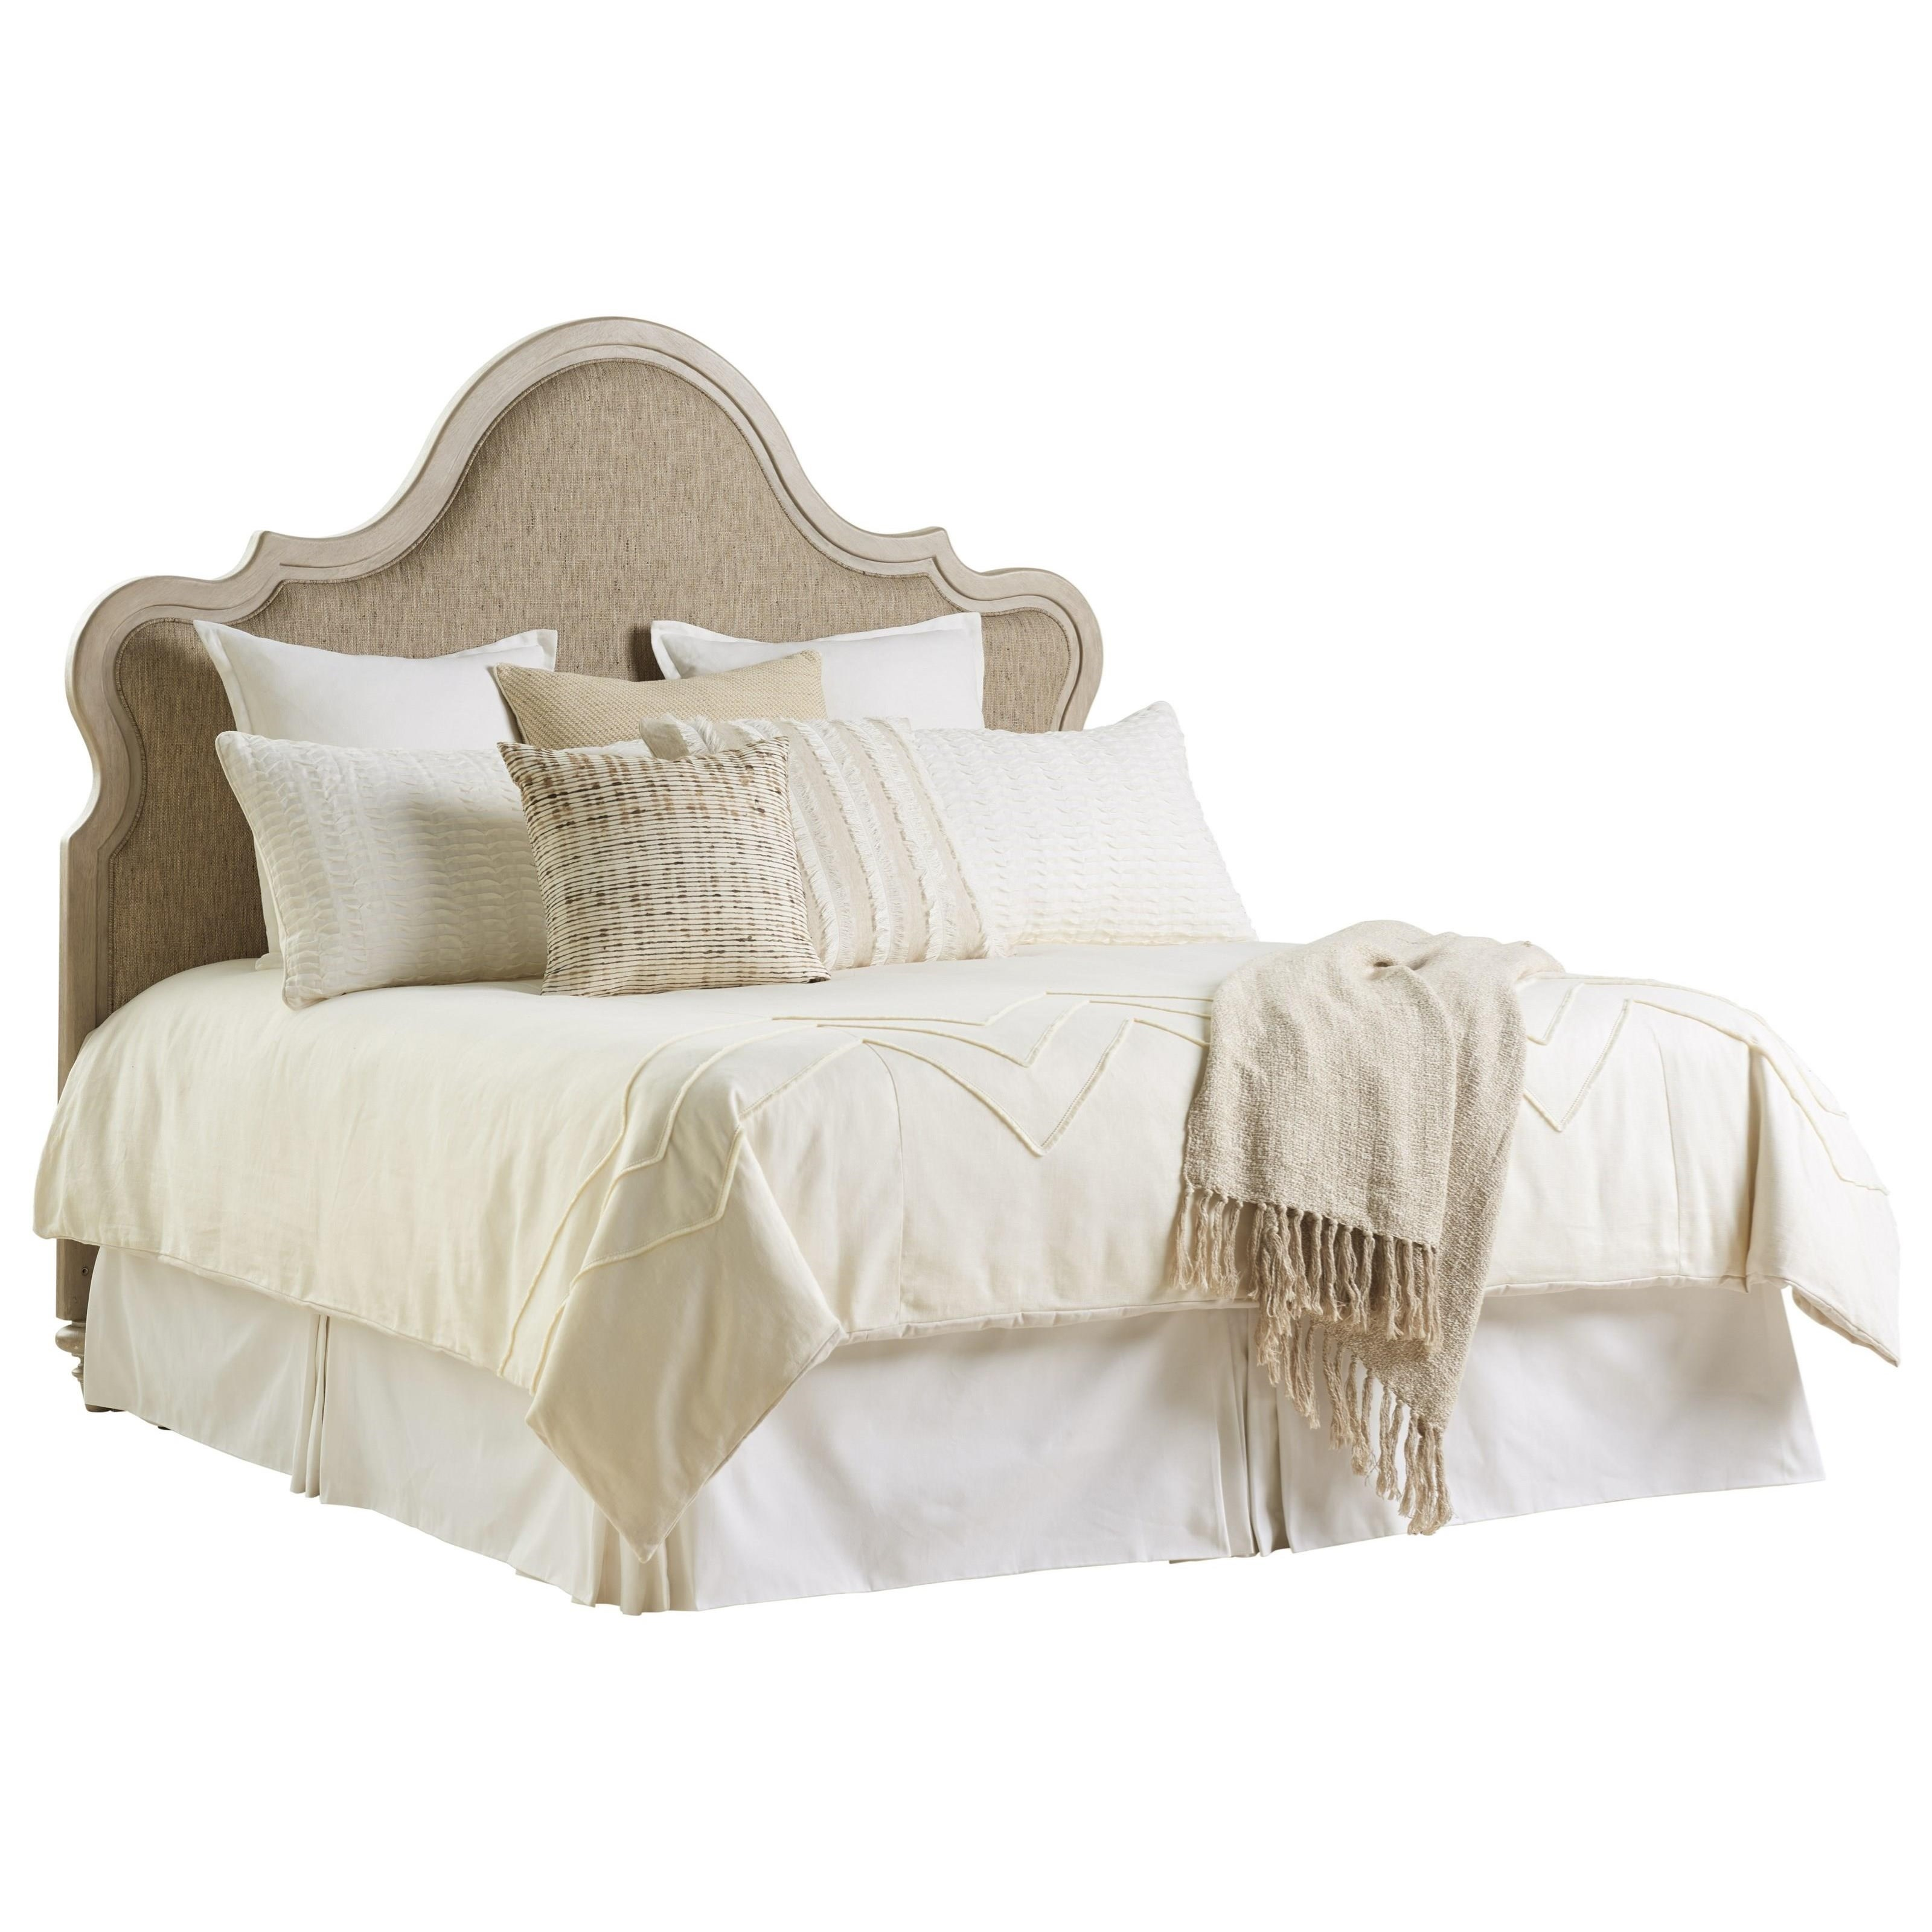 Malibu Zuma Upholstered Headboard by Barclay Butera at Baer's Furniture